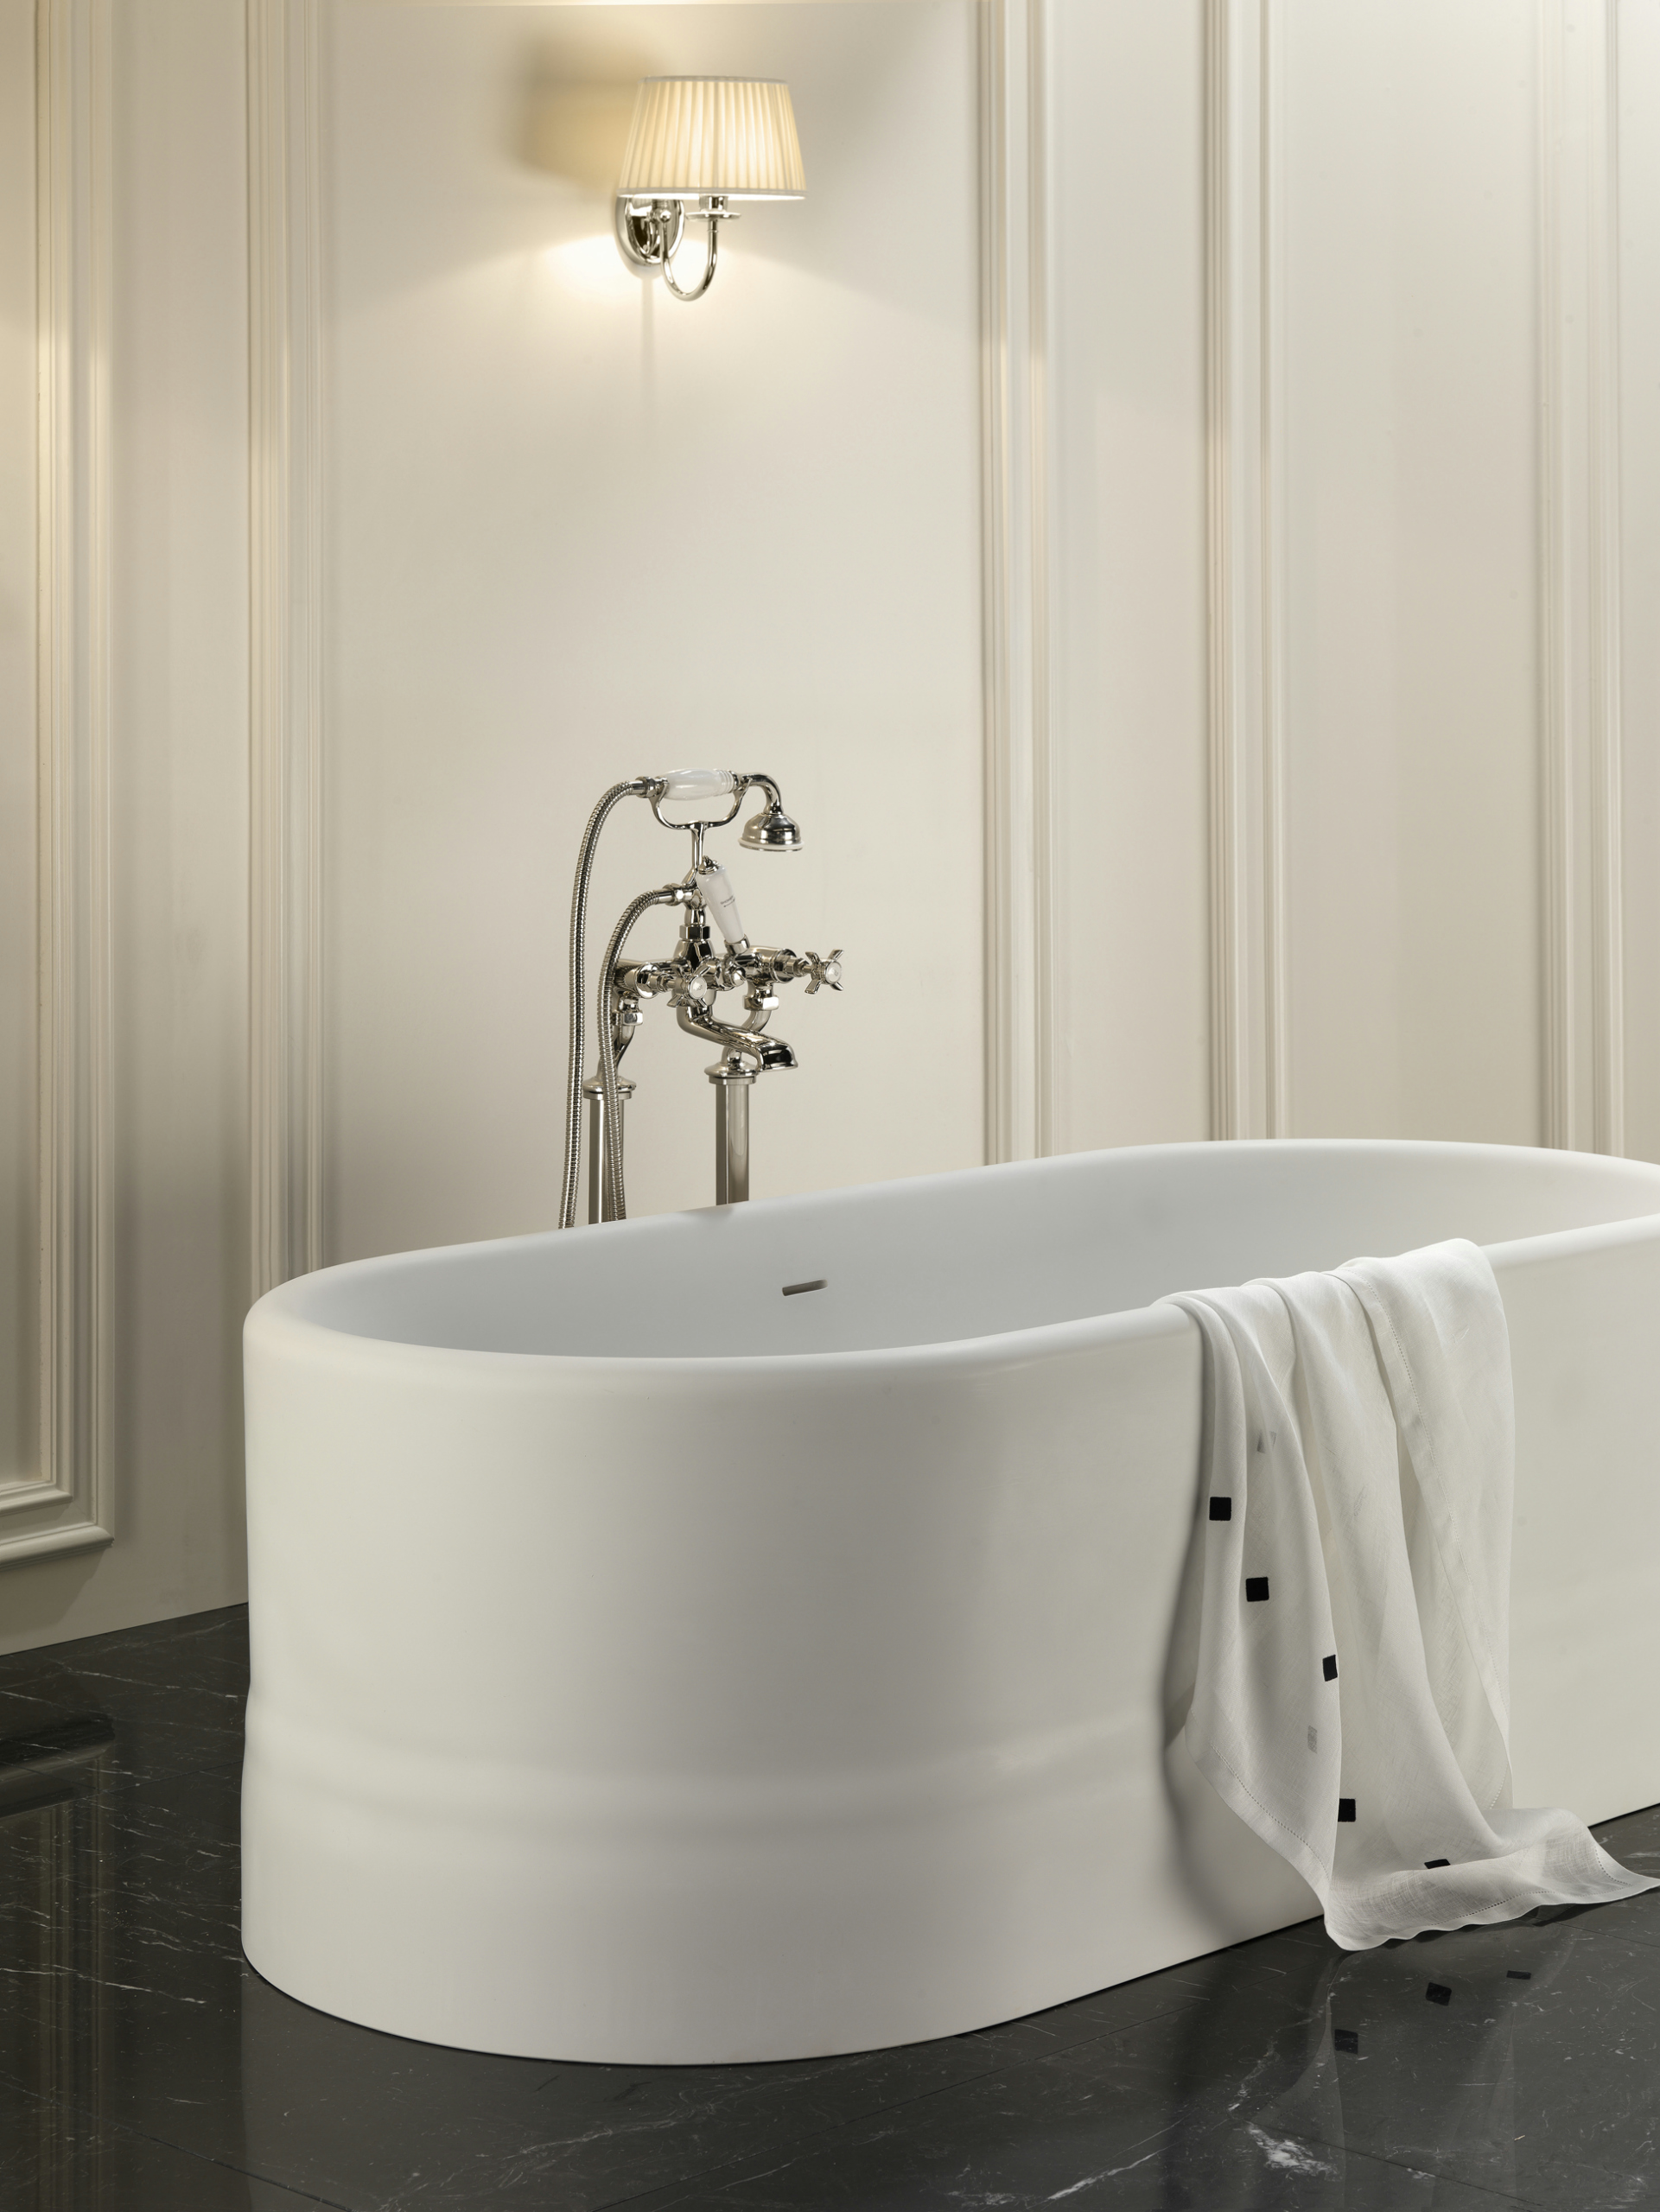 oval bathtub diva by devon devon. Black Bedroom Furniture Sets. Home Design Ideas